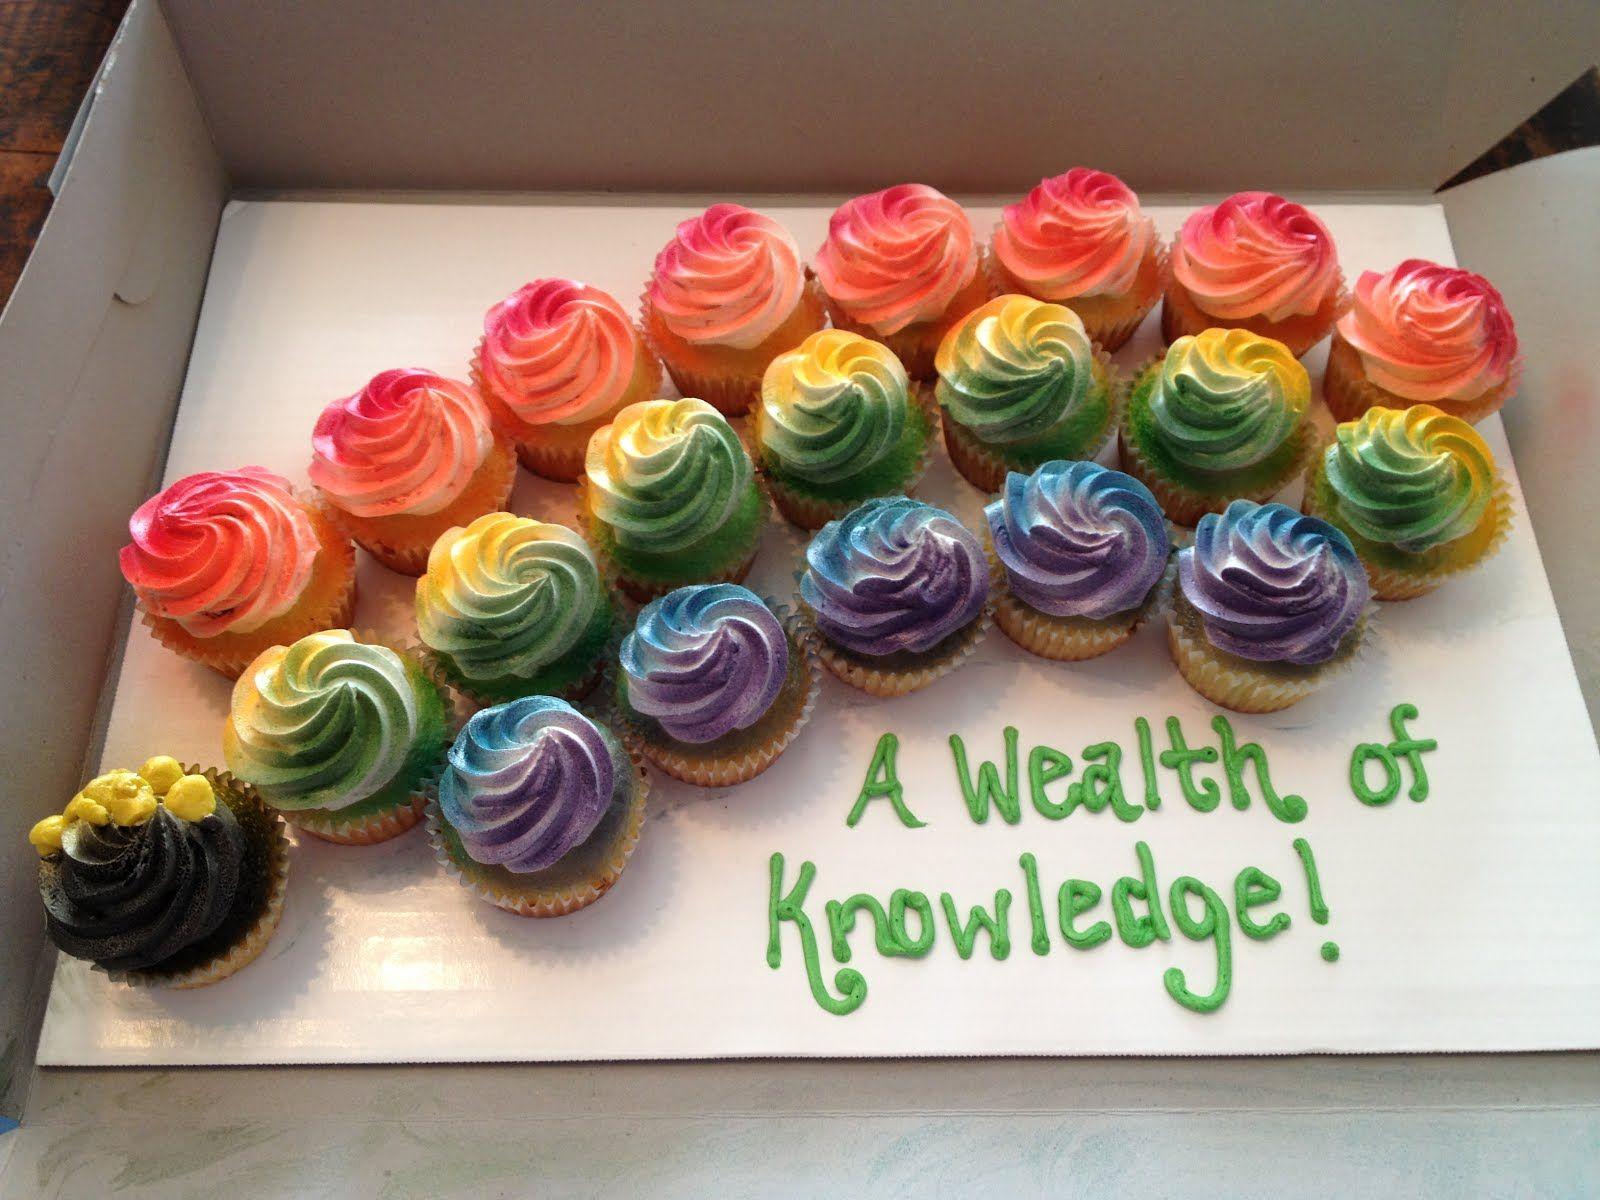 Rainbow cupcakes with sprayed frosting